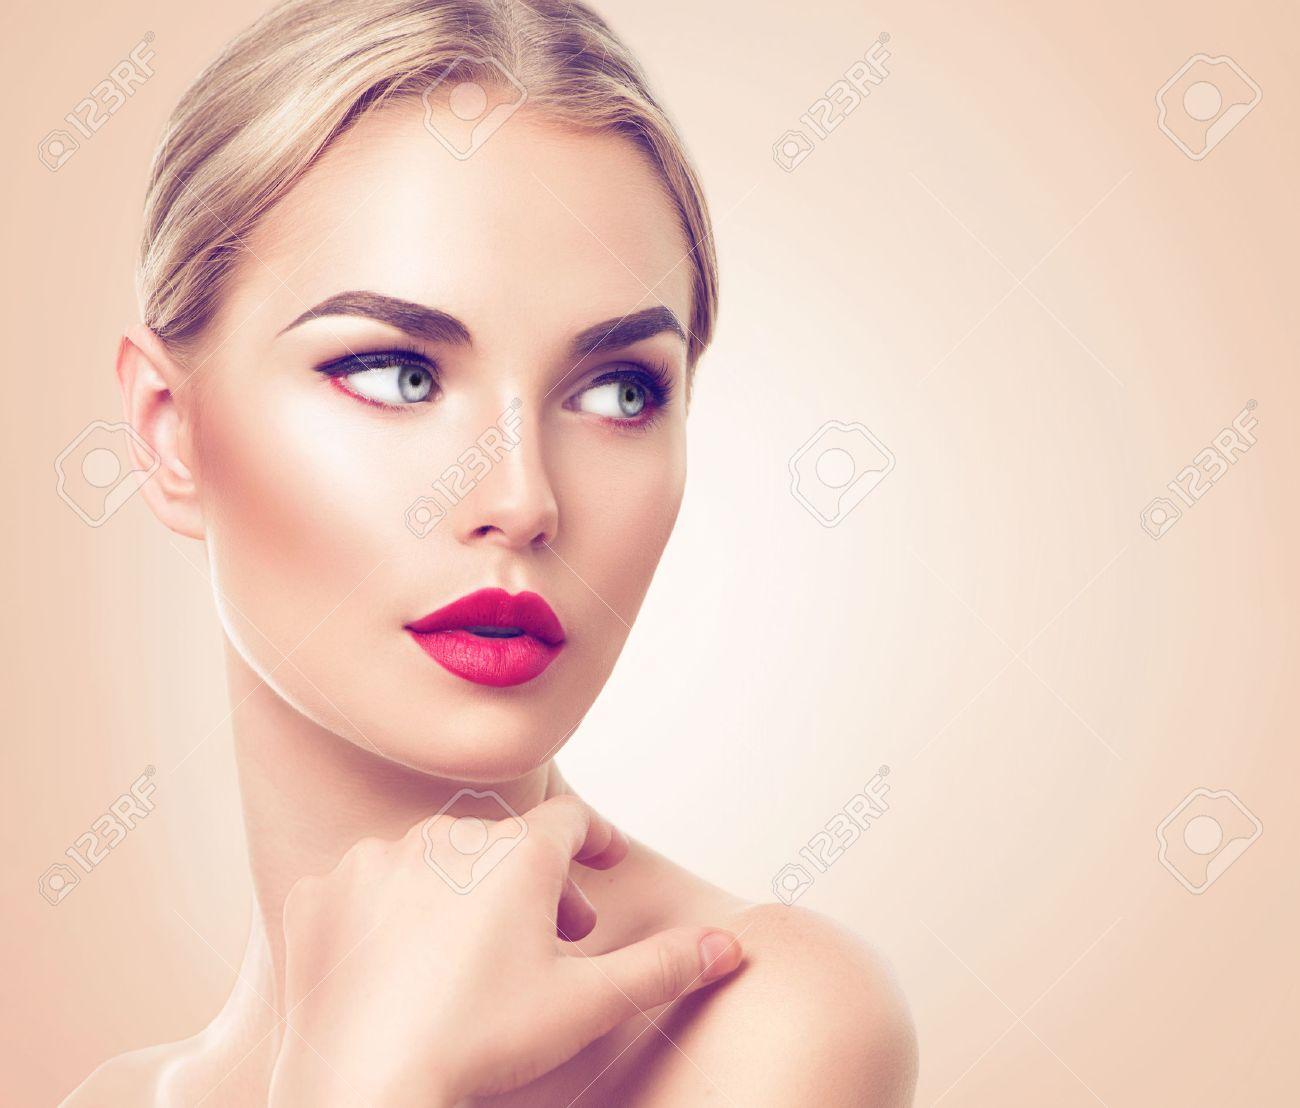 Beautiful Woman Portrait Beauty Spa Woman With Fresh Skin And